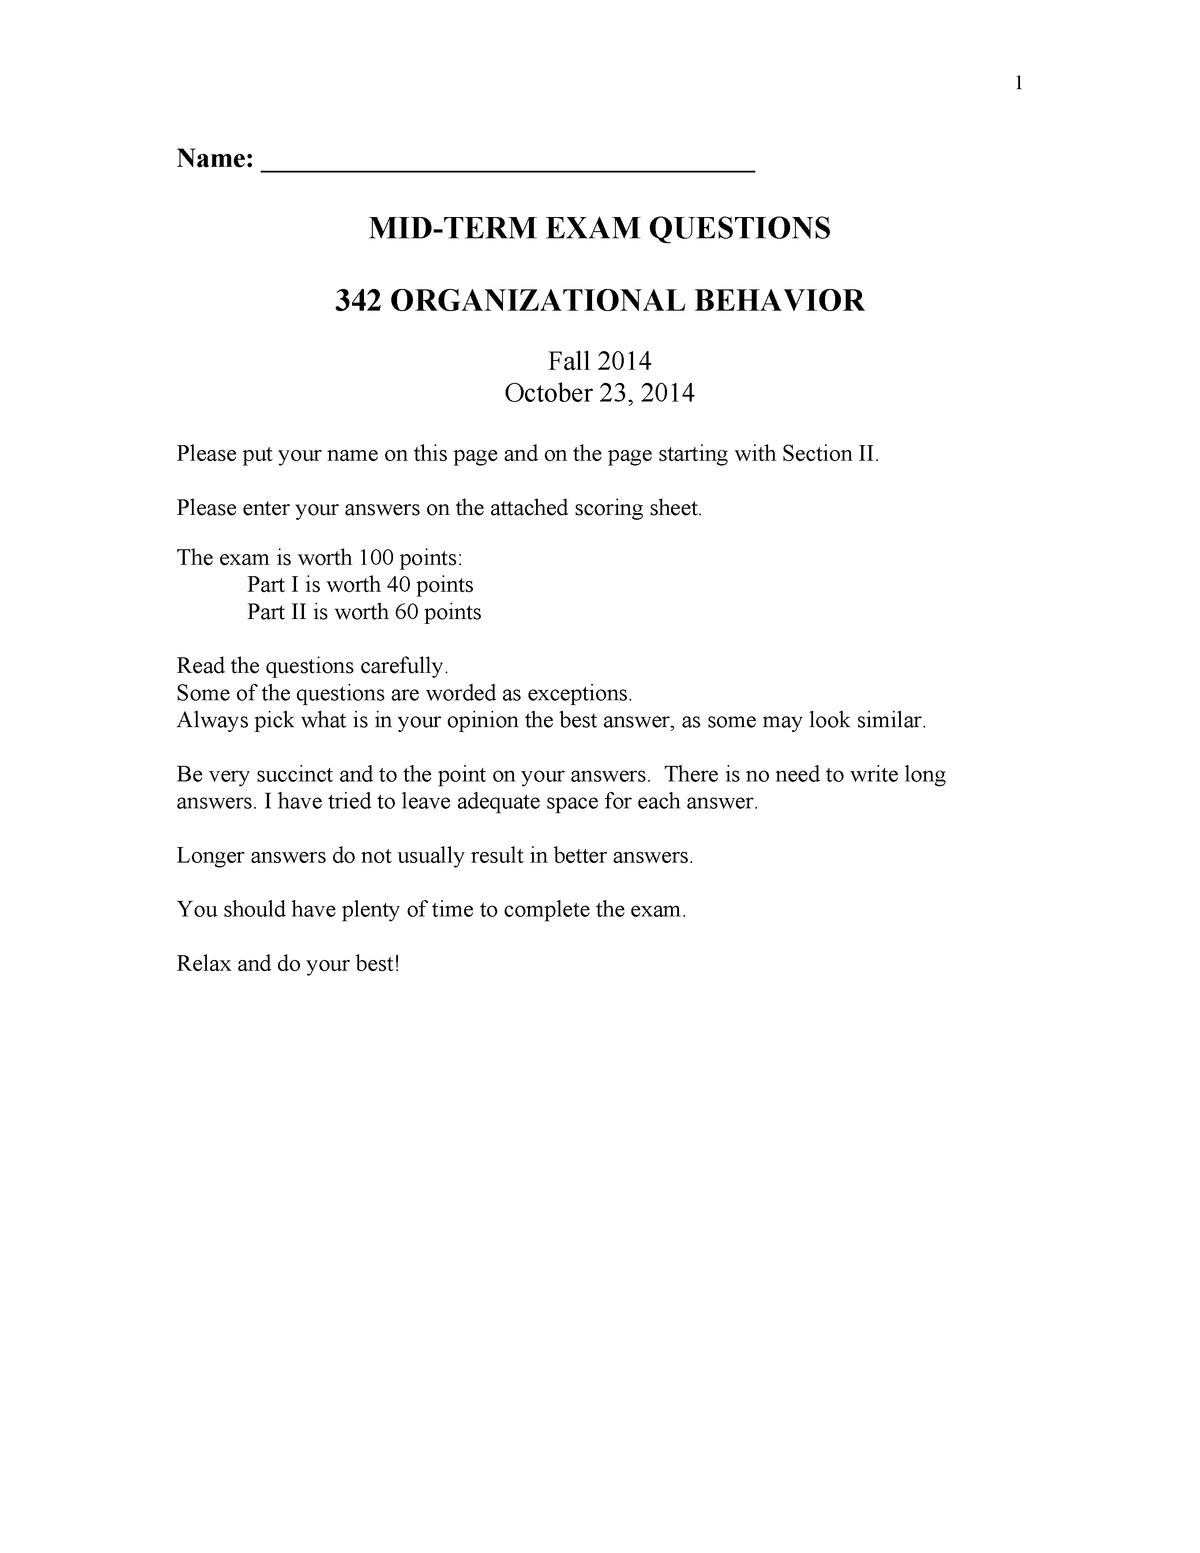 Exam 2014 - IEMS 342: Organizational Behavior - StuDocu